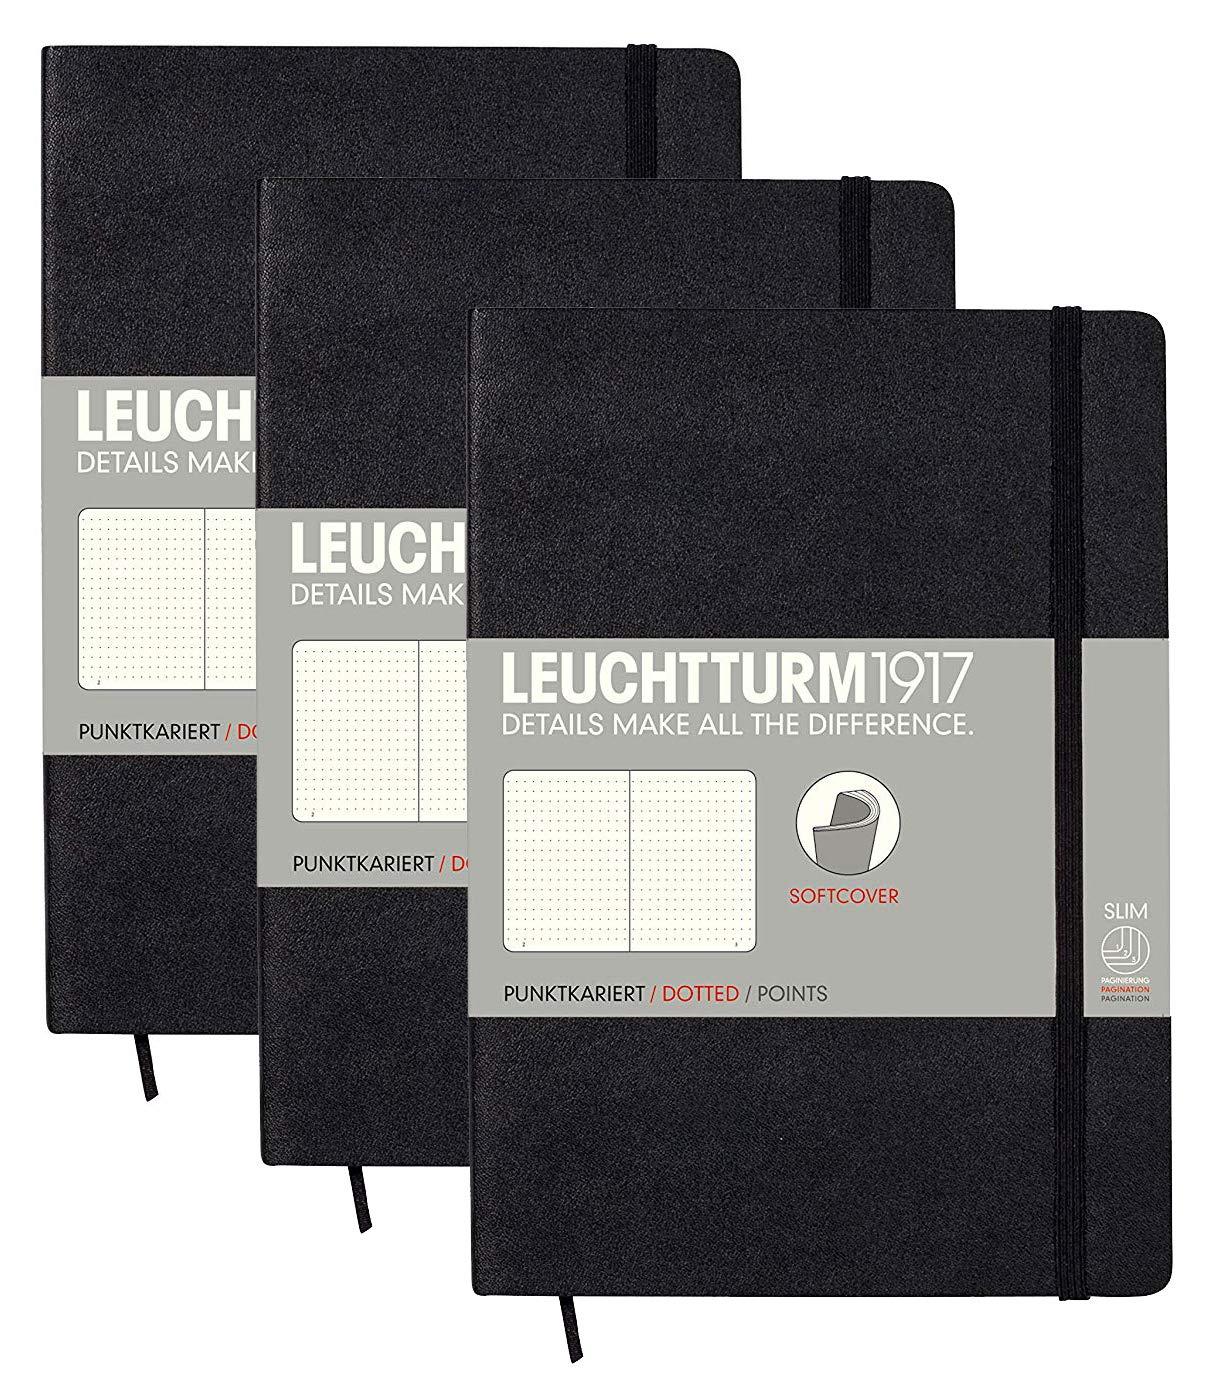 Leuchtturm ソフトカバー ミディアム A5 水玉ノートブック3冊セット [ブラック]   B07NM2DC9W